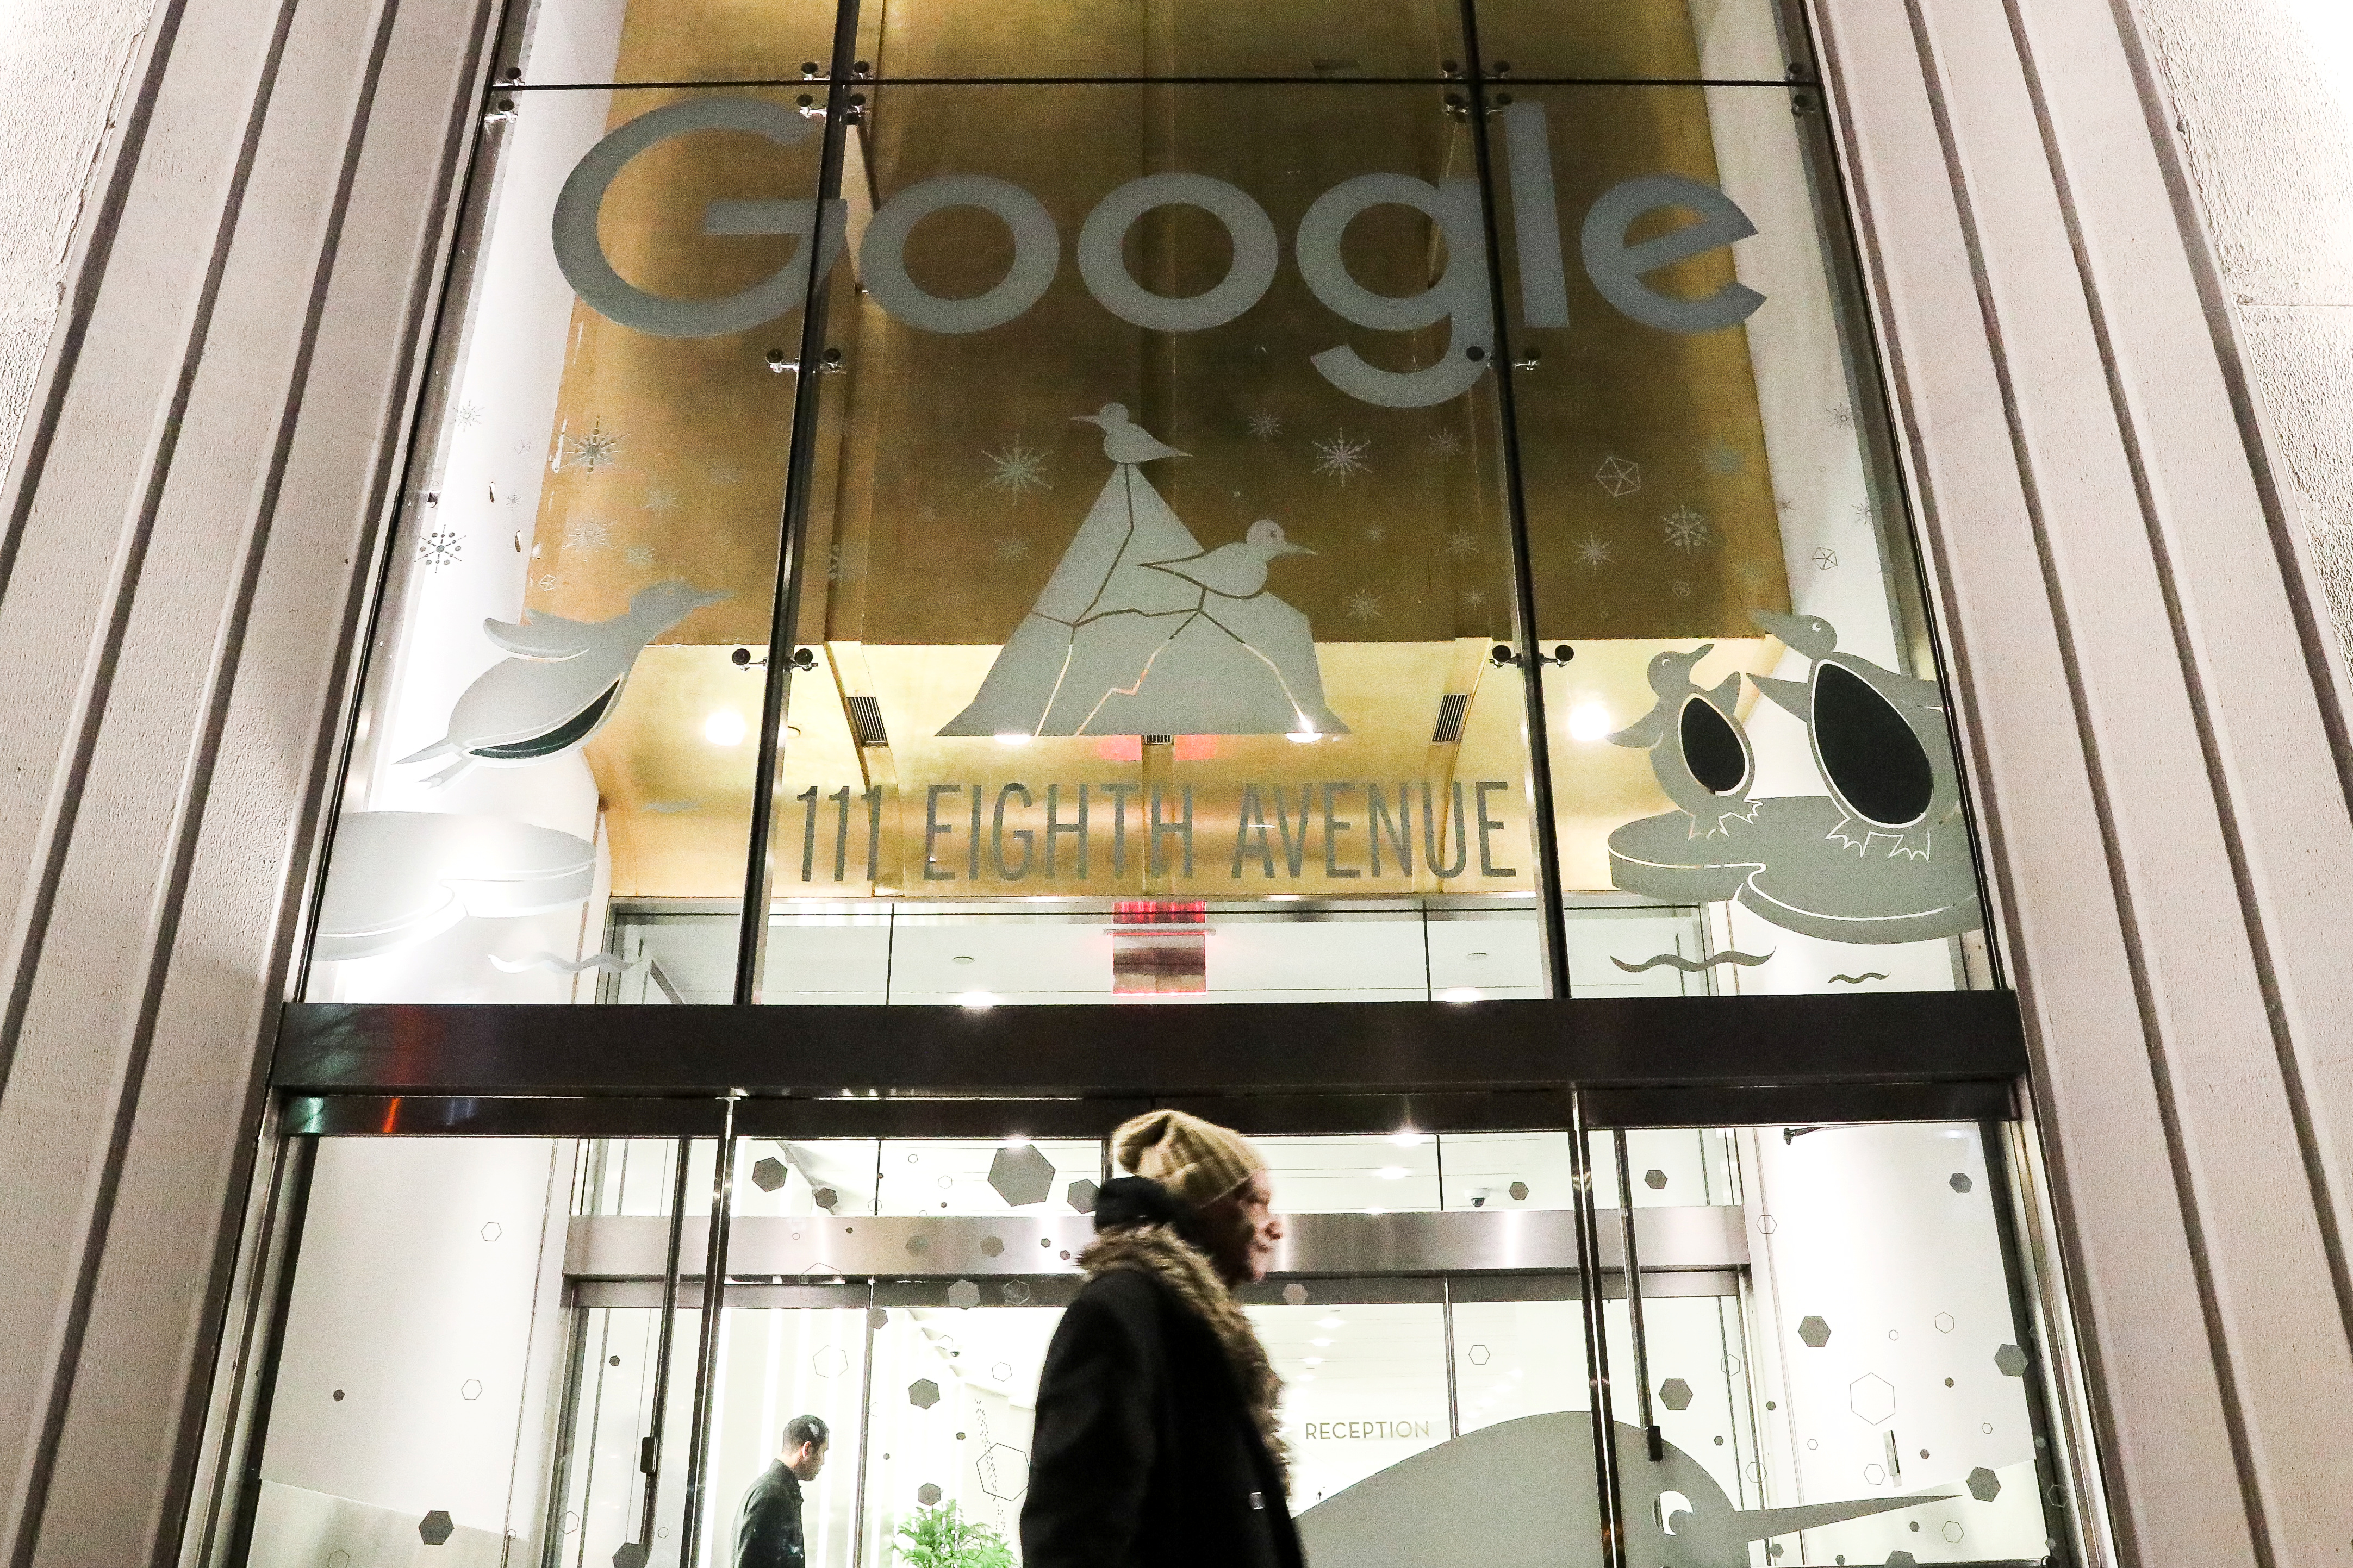 A pedestrian walks past Google headquarters in the Manhattan borough of New York City, New York, U.S., December 17, 2018. REUTERS/Jeenah Moon